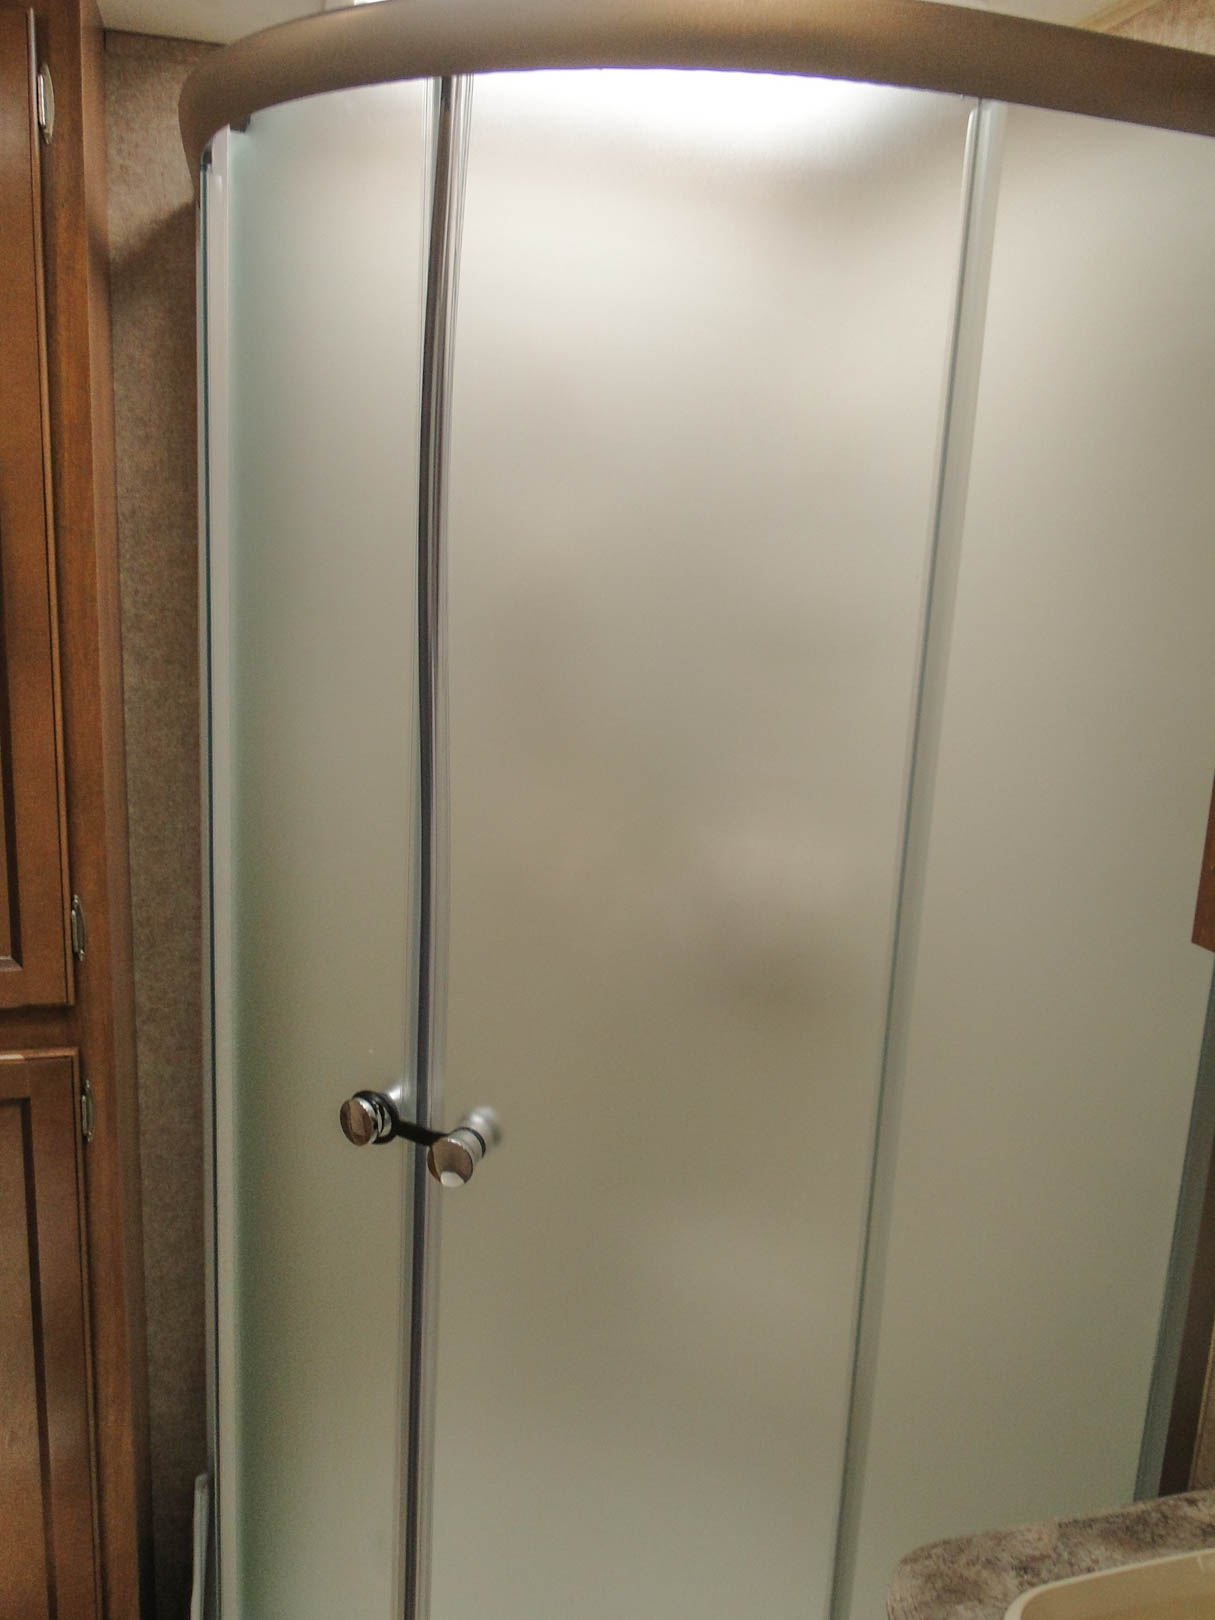 easy glass range door is a new front of living pa rving room shower lerch open rv york doors flr dealers breed pennsylvania